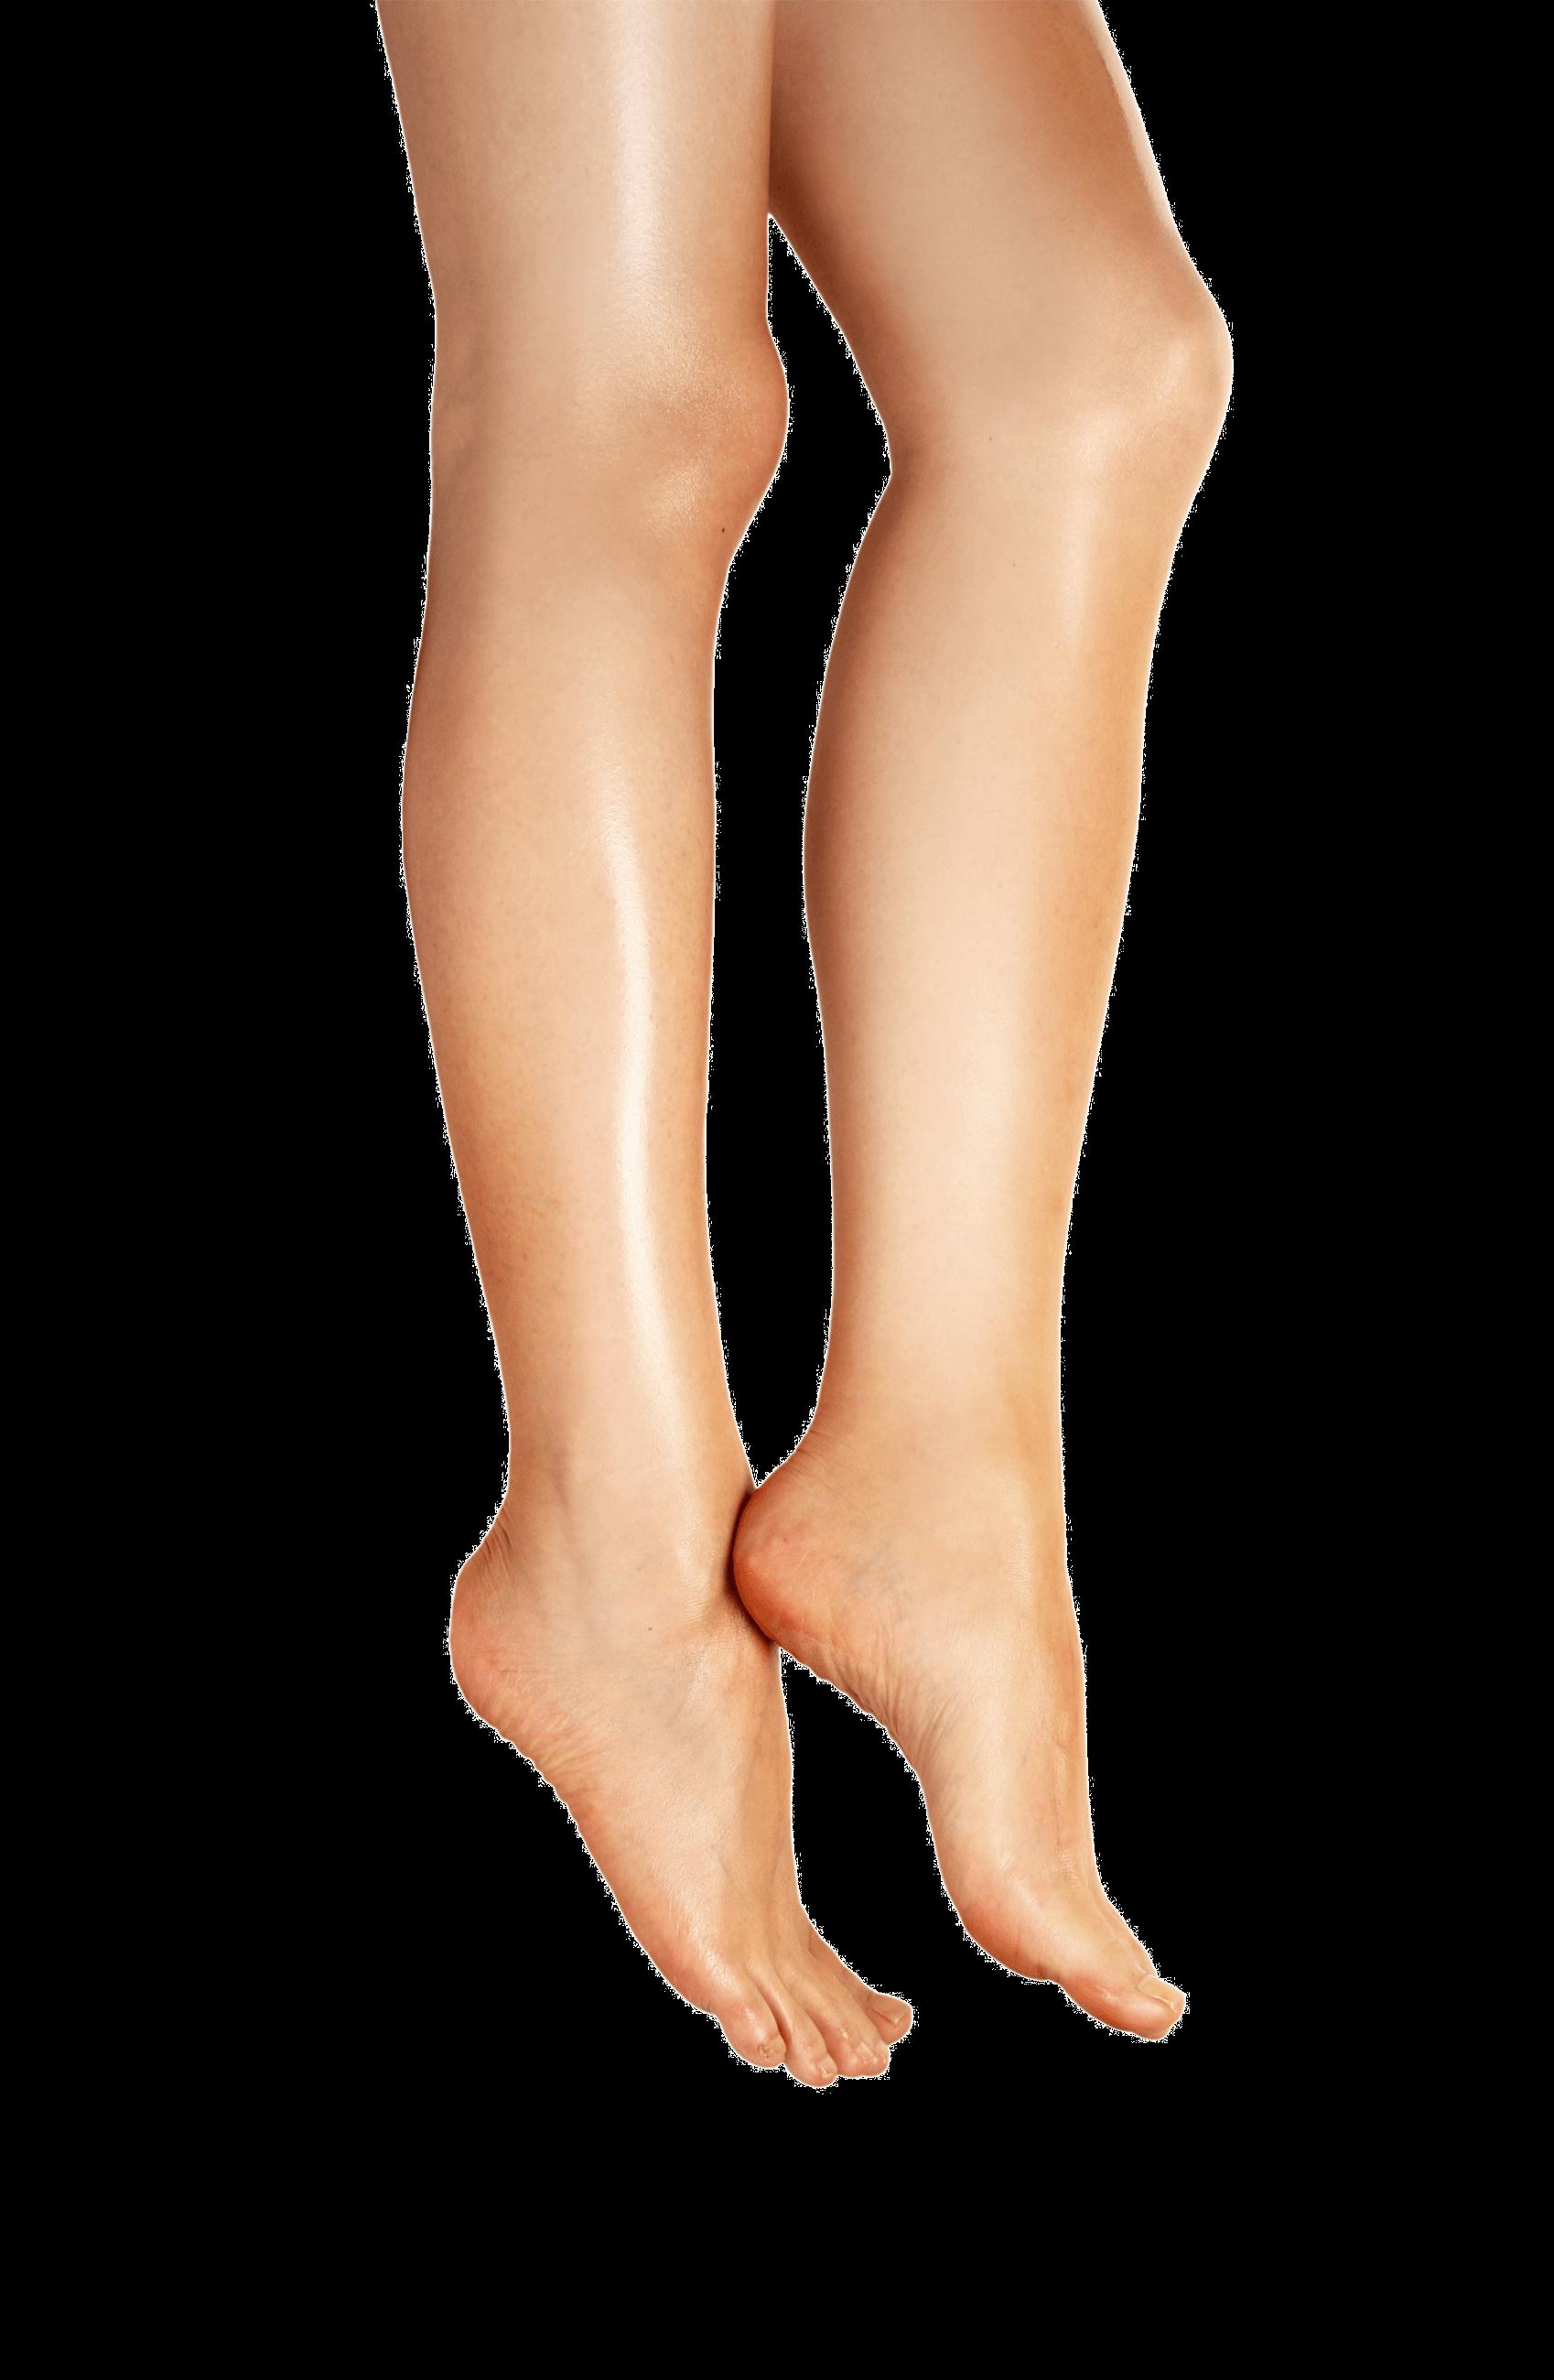 Legs PNG-PlusPNG.com-1698 - Legs PNG